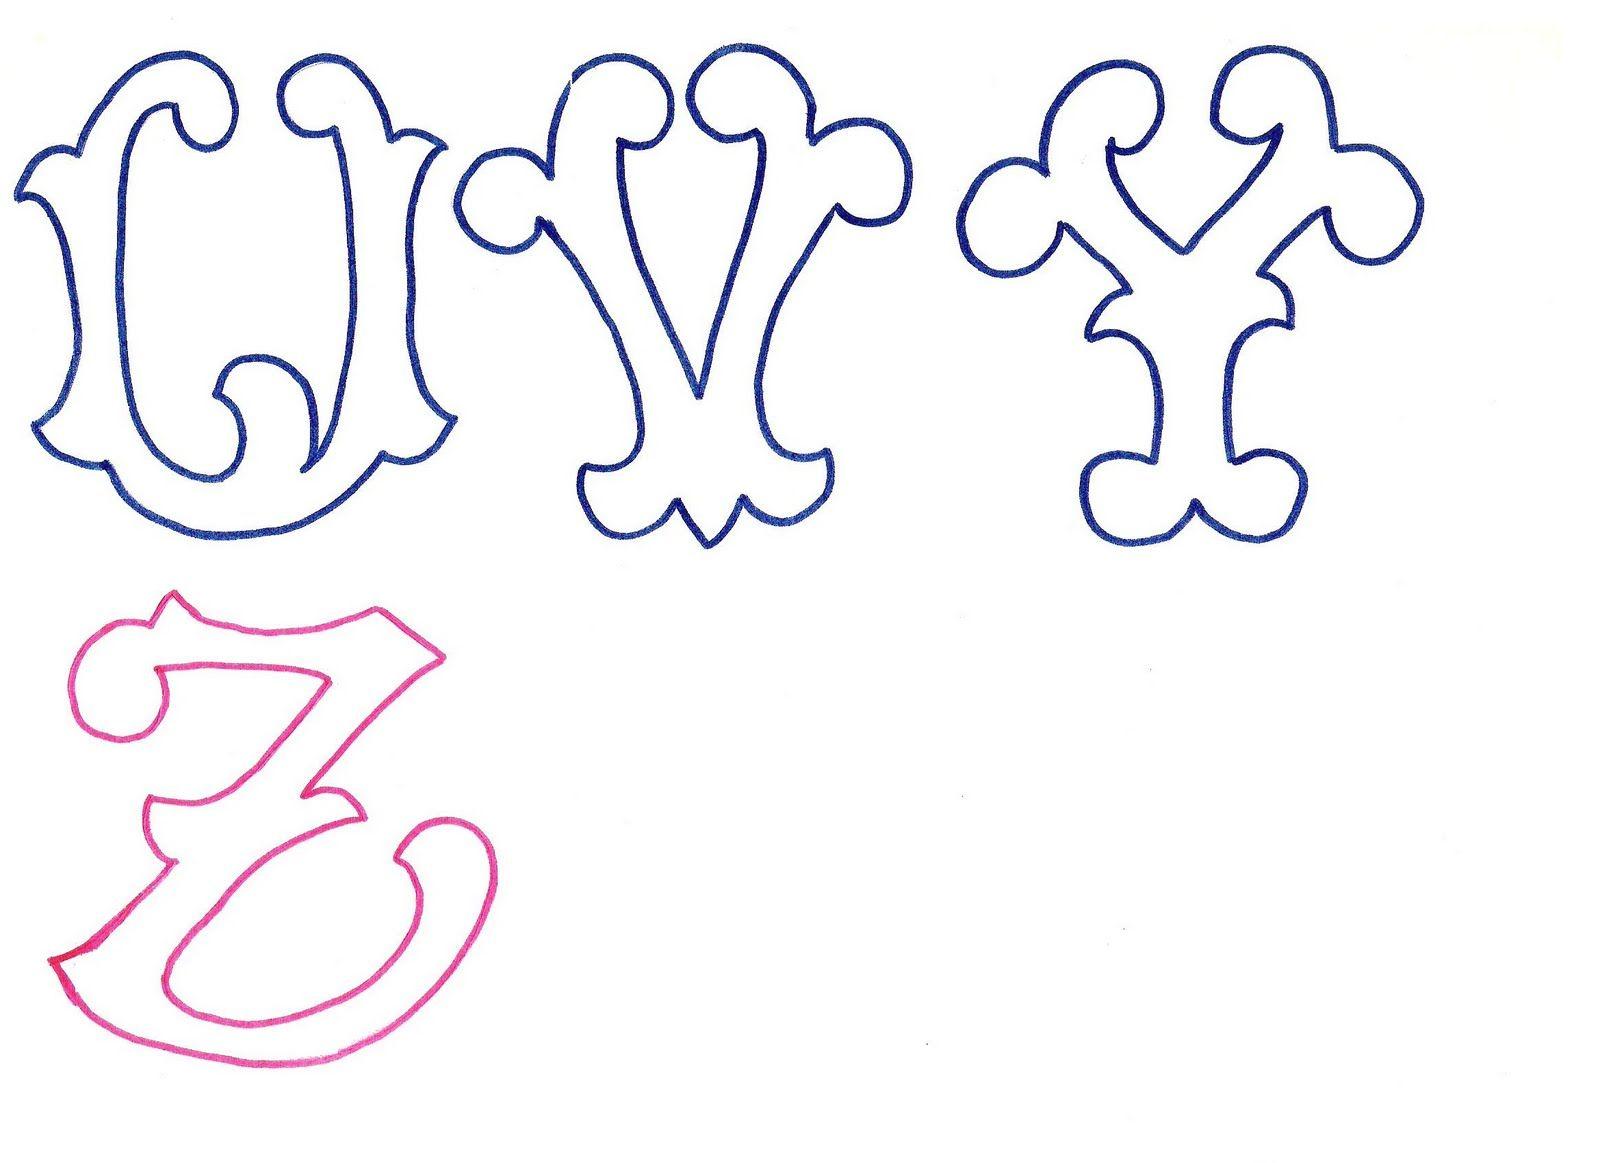 images for ue letras bonitas para tatuajes